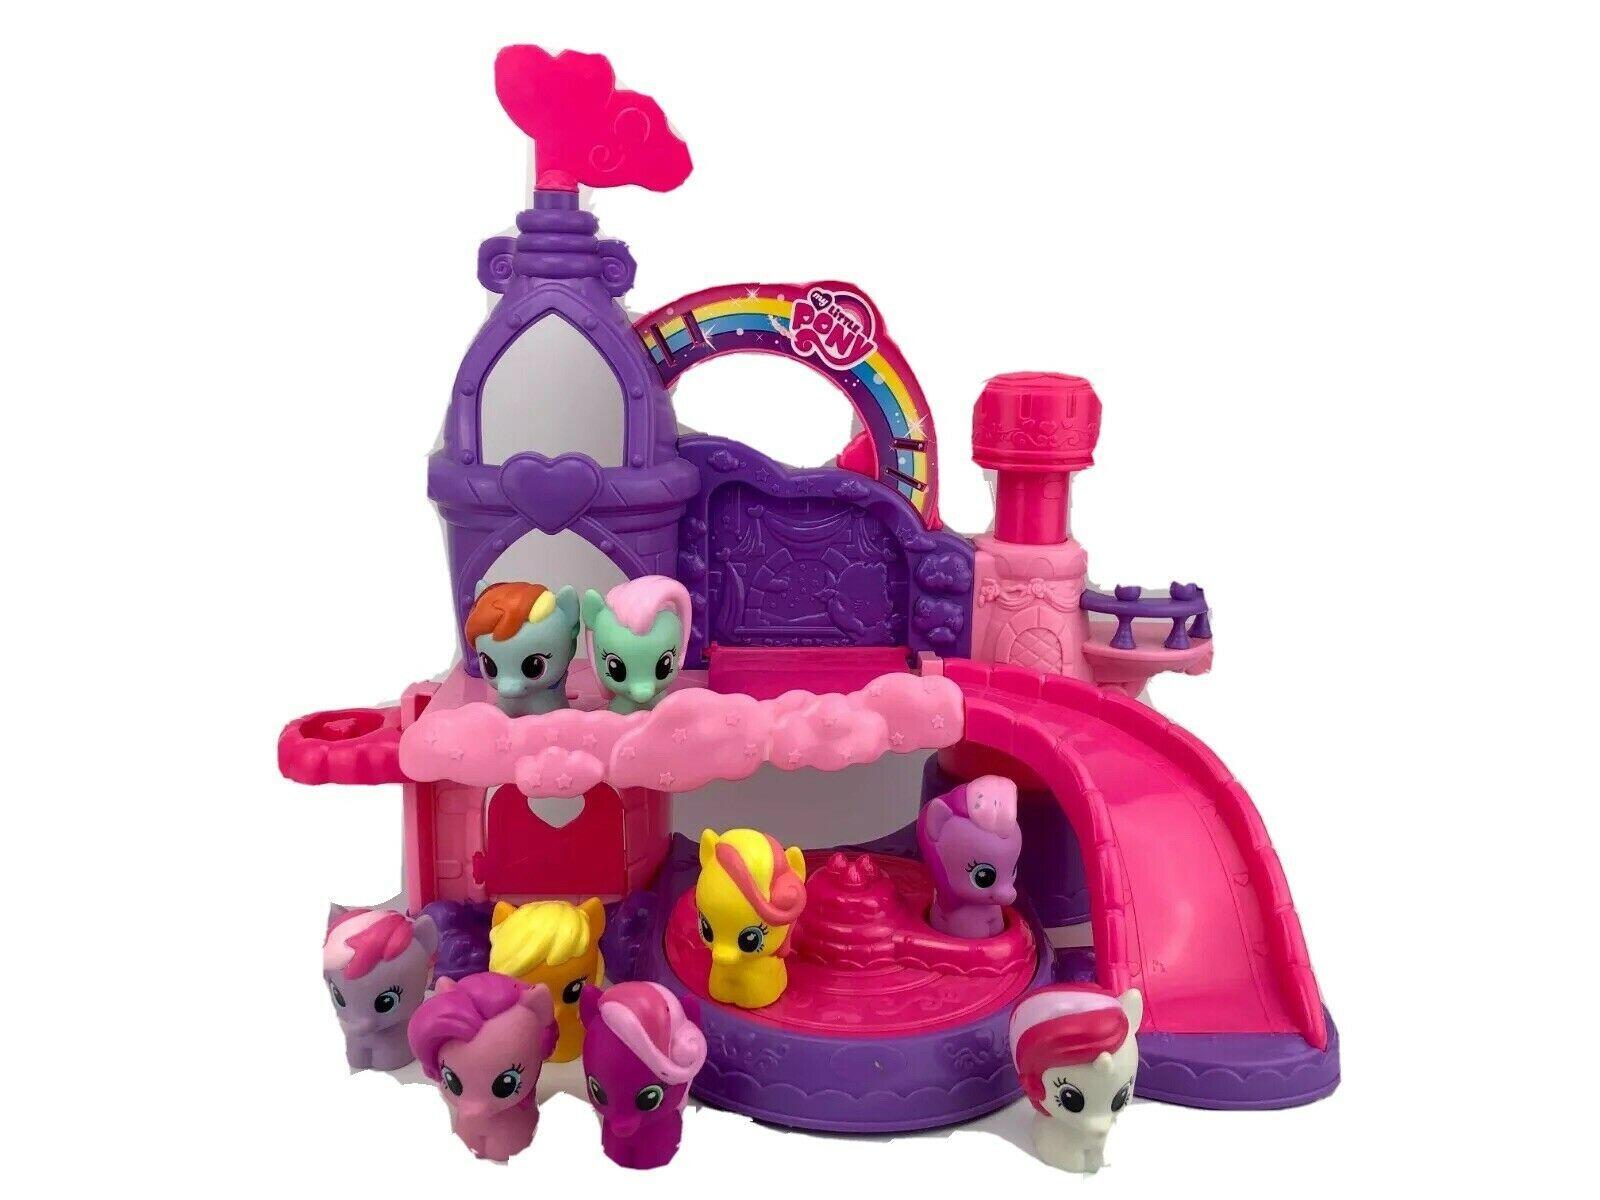 Playskool Friends Musical Celebration Castle My Little Pony Playset - $12.64